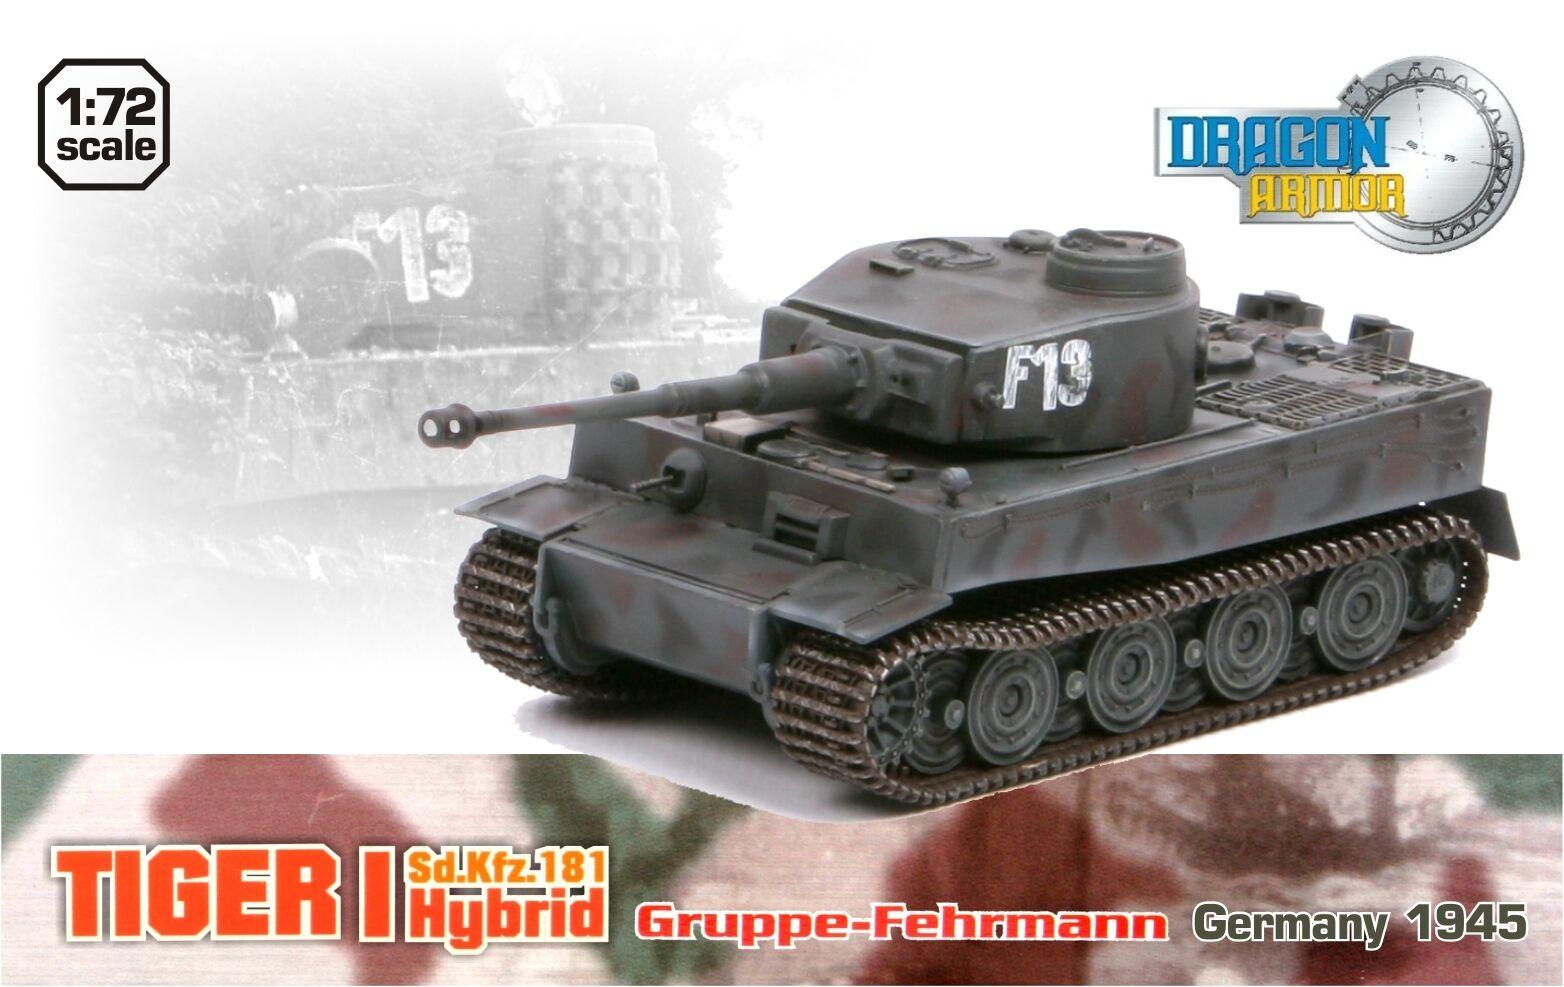 Dragon armor 1 72,     Extra Rare     German Tiger I Hybrid,  Art.  60290